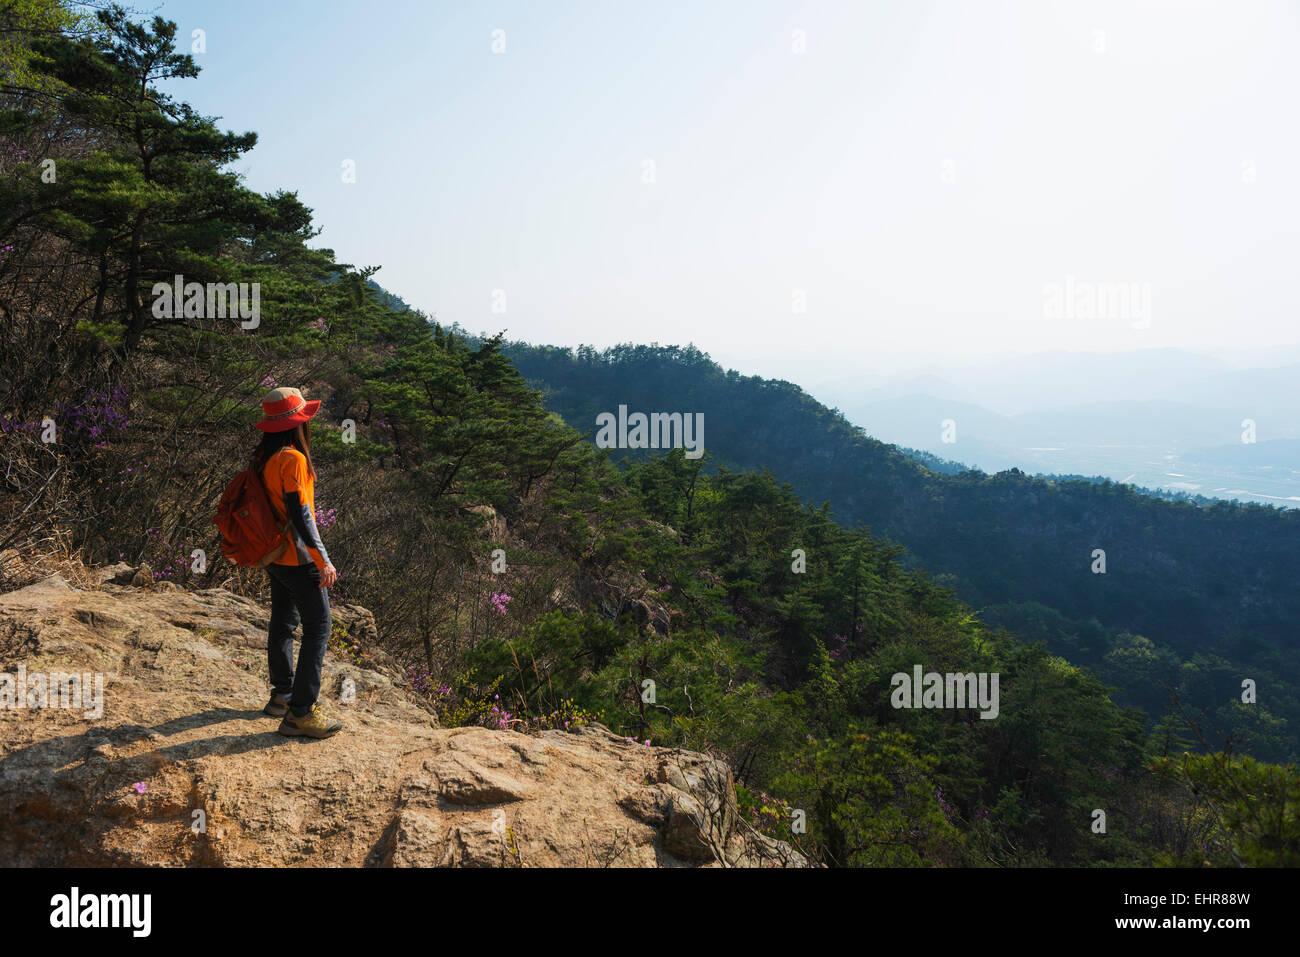 Asia, Republic of Korea, South Korea, Gyeongsangbuk-do, Gyeongju, hiker in Mt Namsan National Park, Unesco site - Stock Image